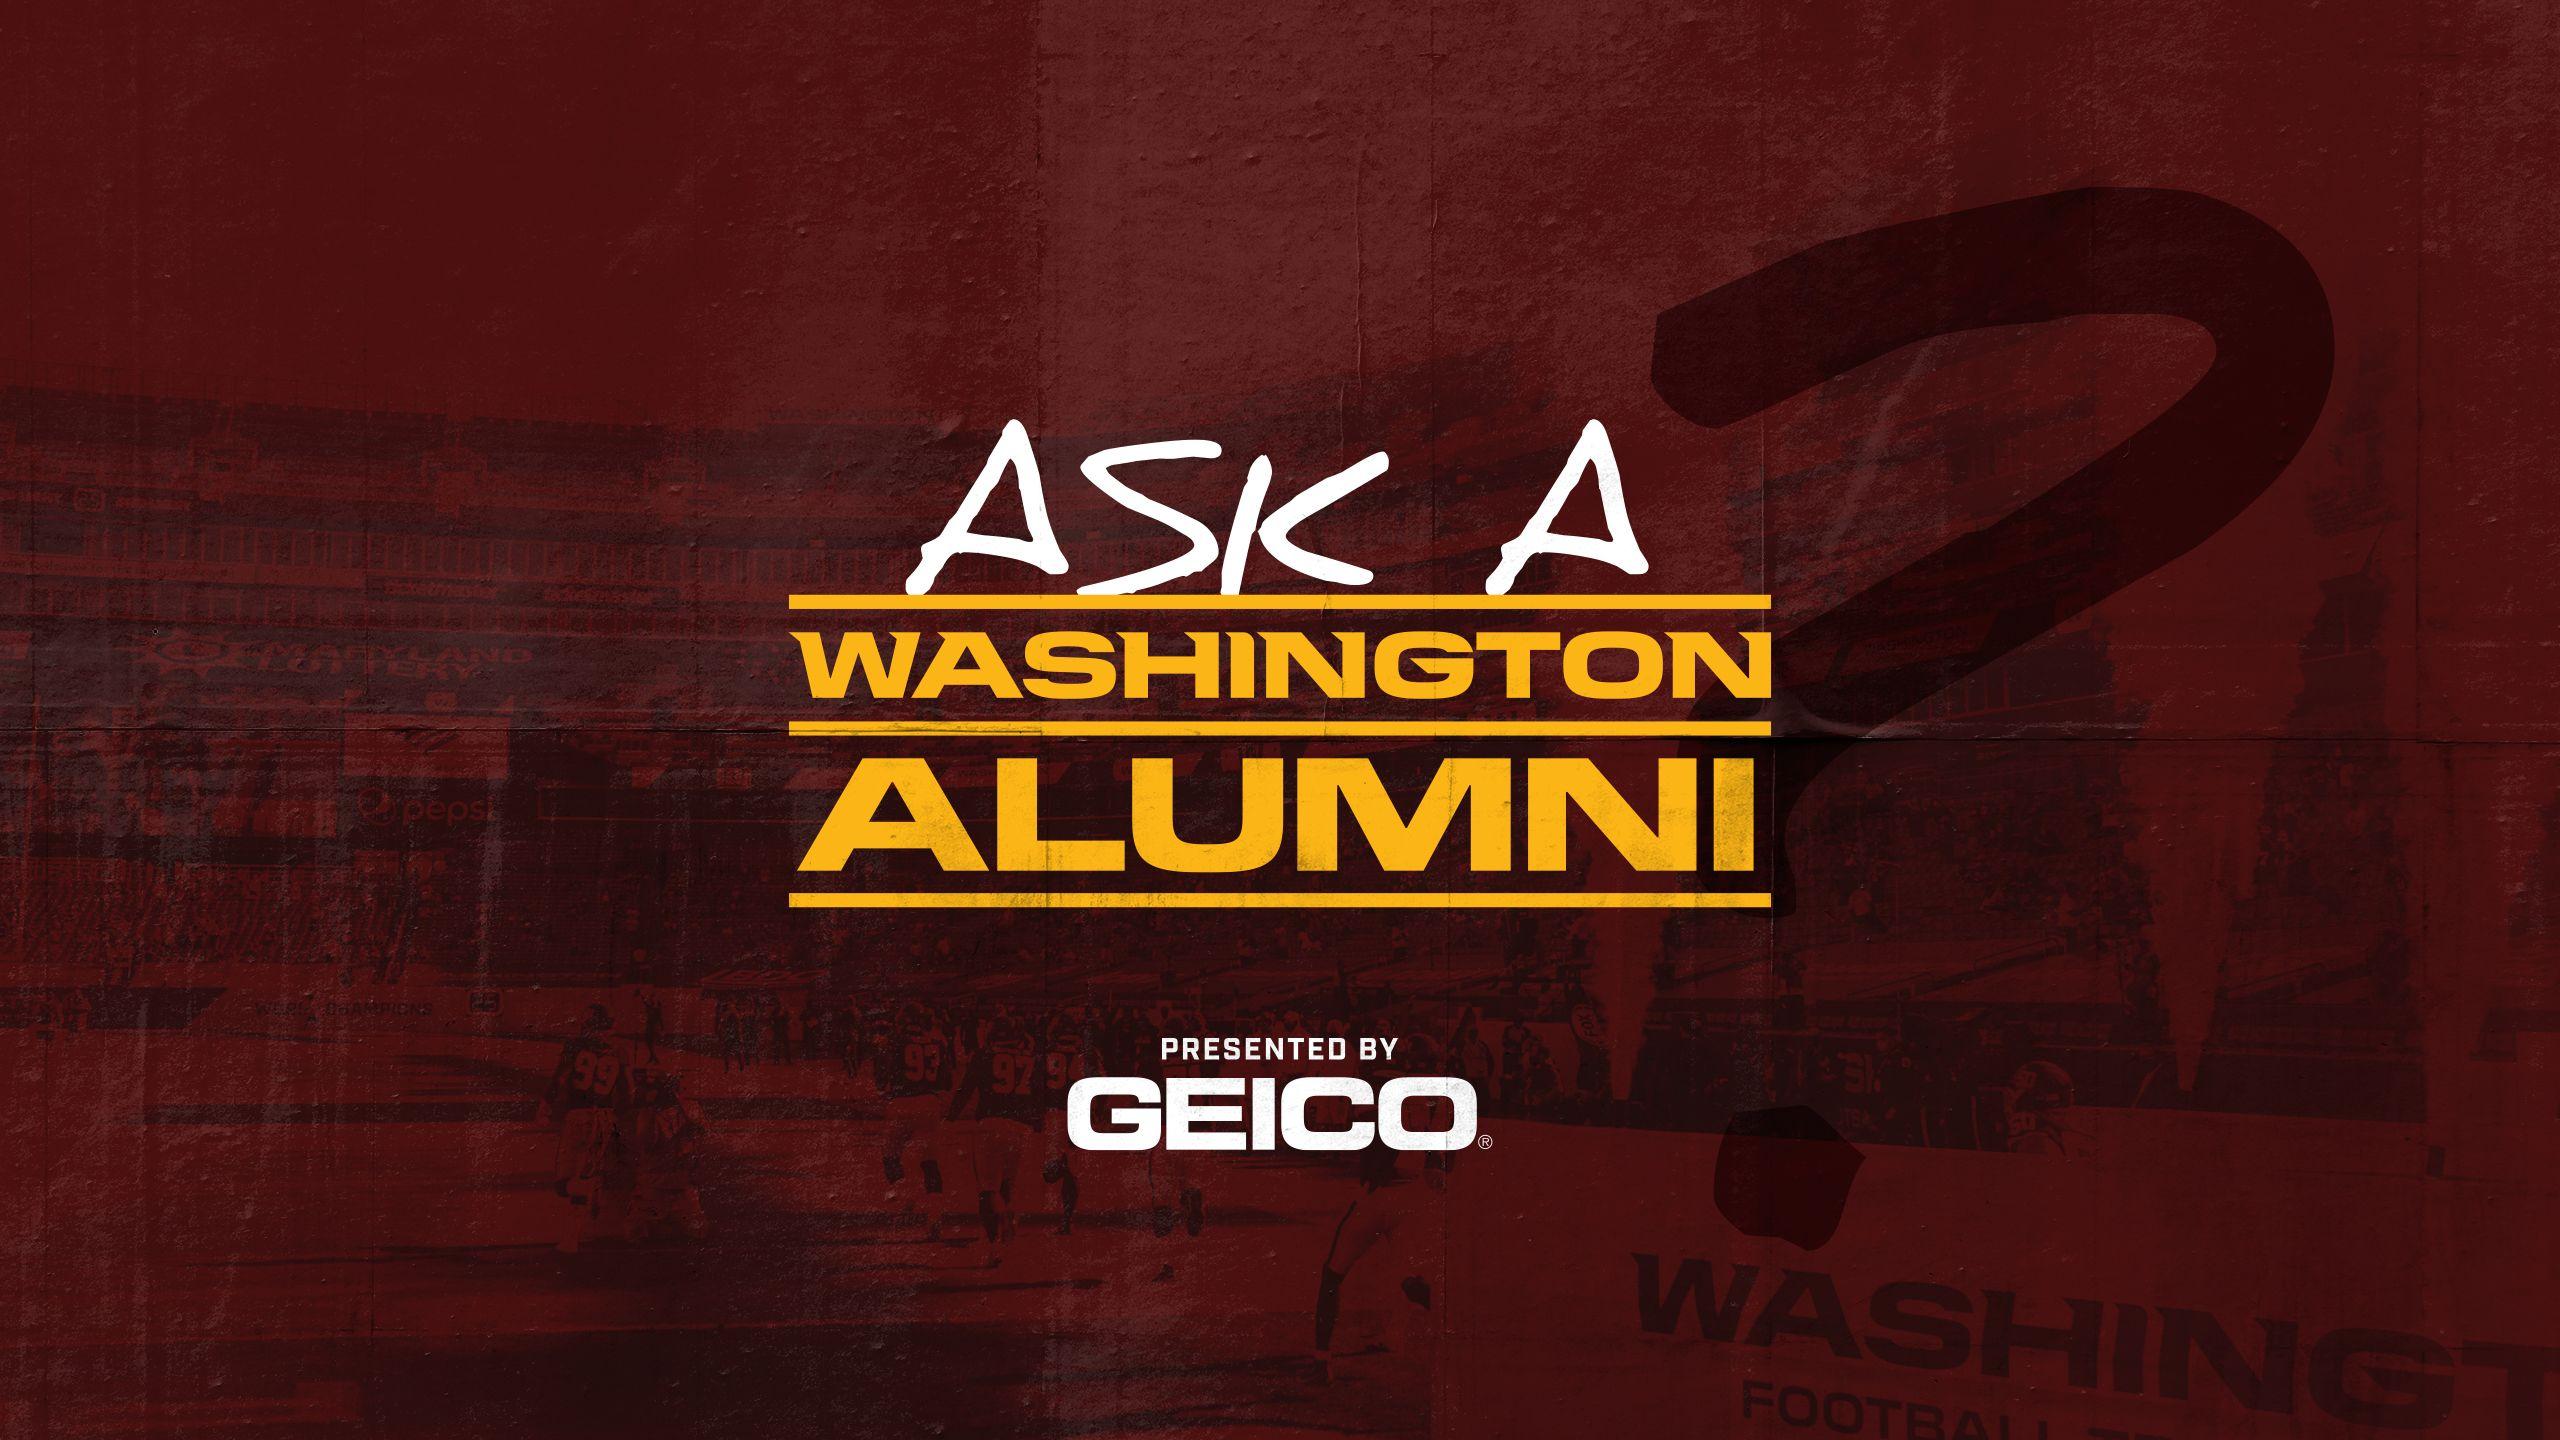 AskAWashAlumni_Segmenttitle+Geico_16x9